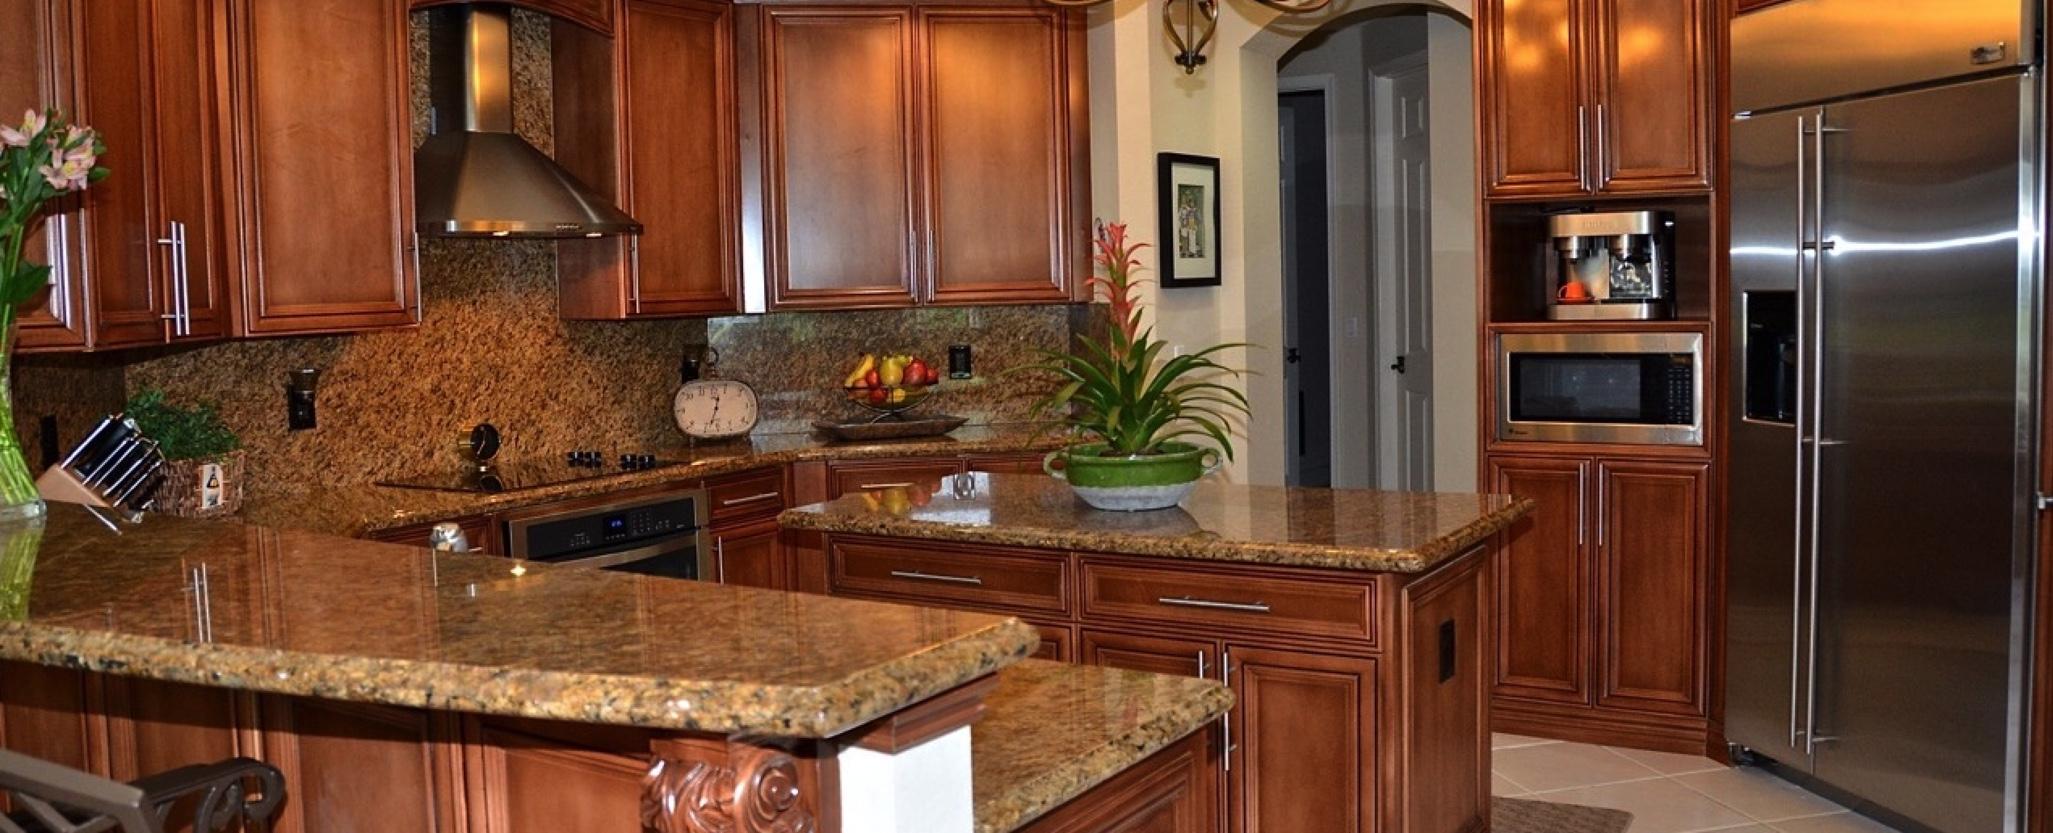 Kitchen Bathroom Cabinet Remodeling Resurfacing In Miramar Fl Quality Cabinets